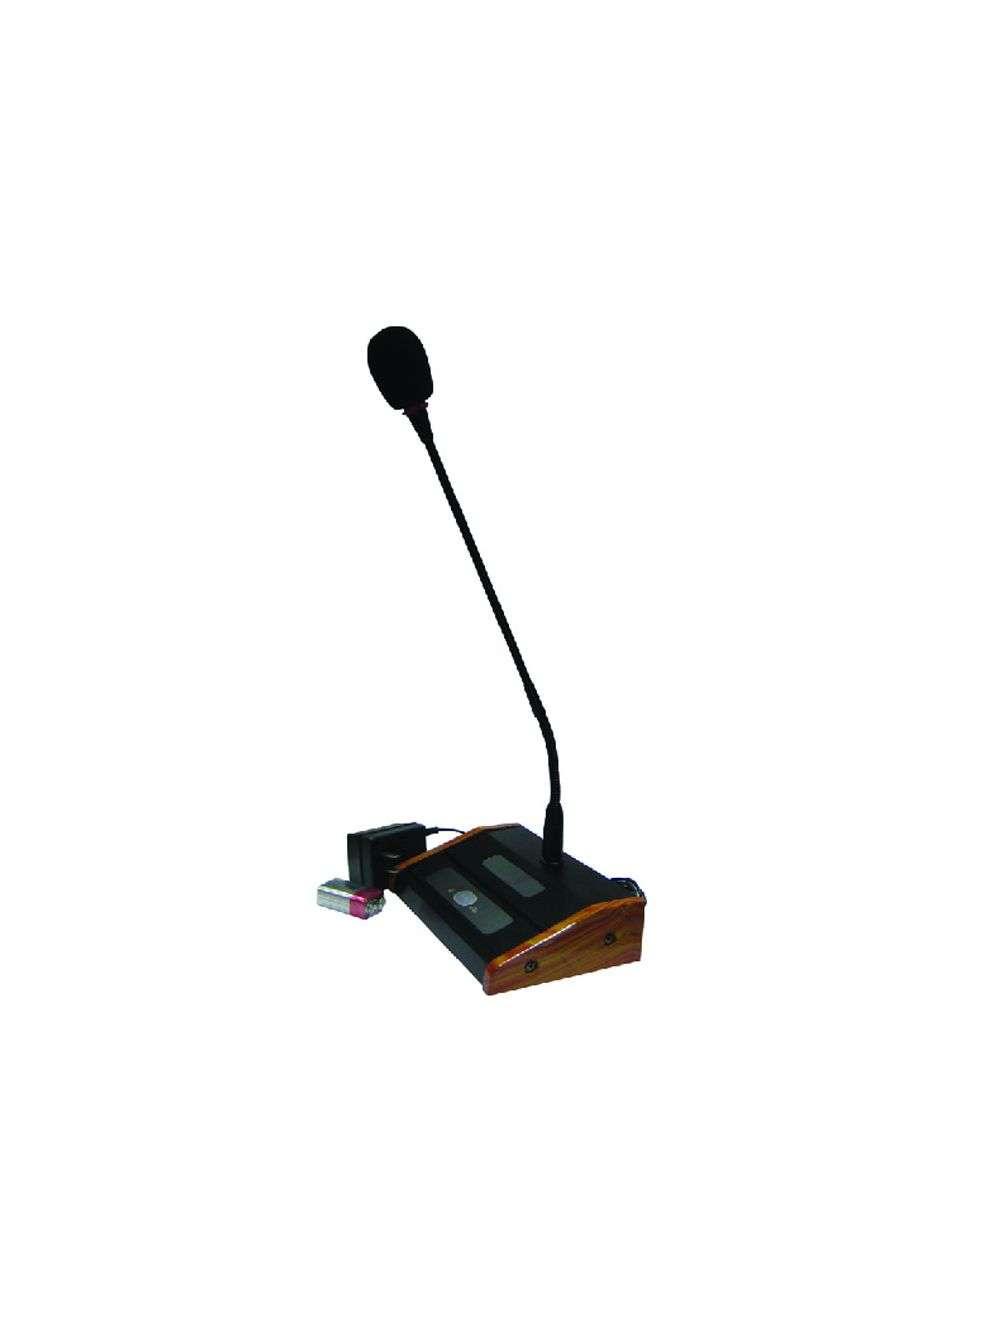 ميكروفون صوت رنين مدمج